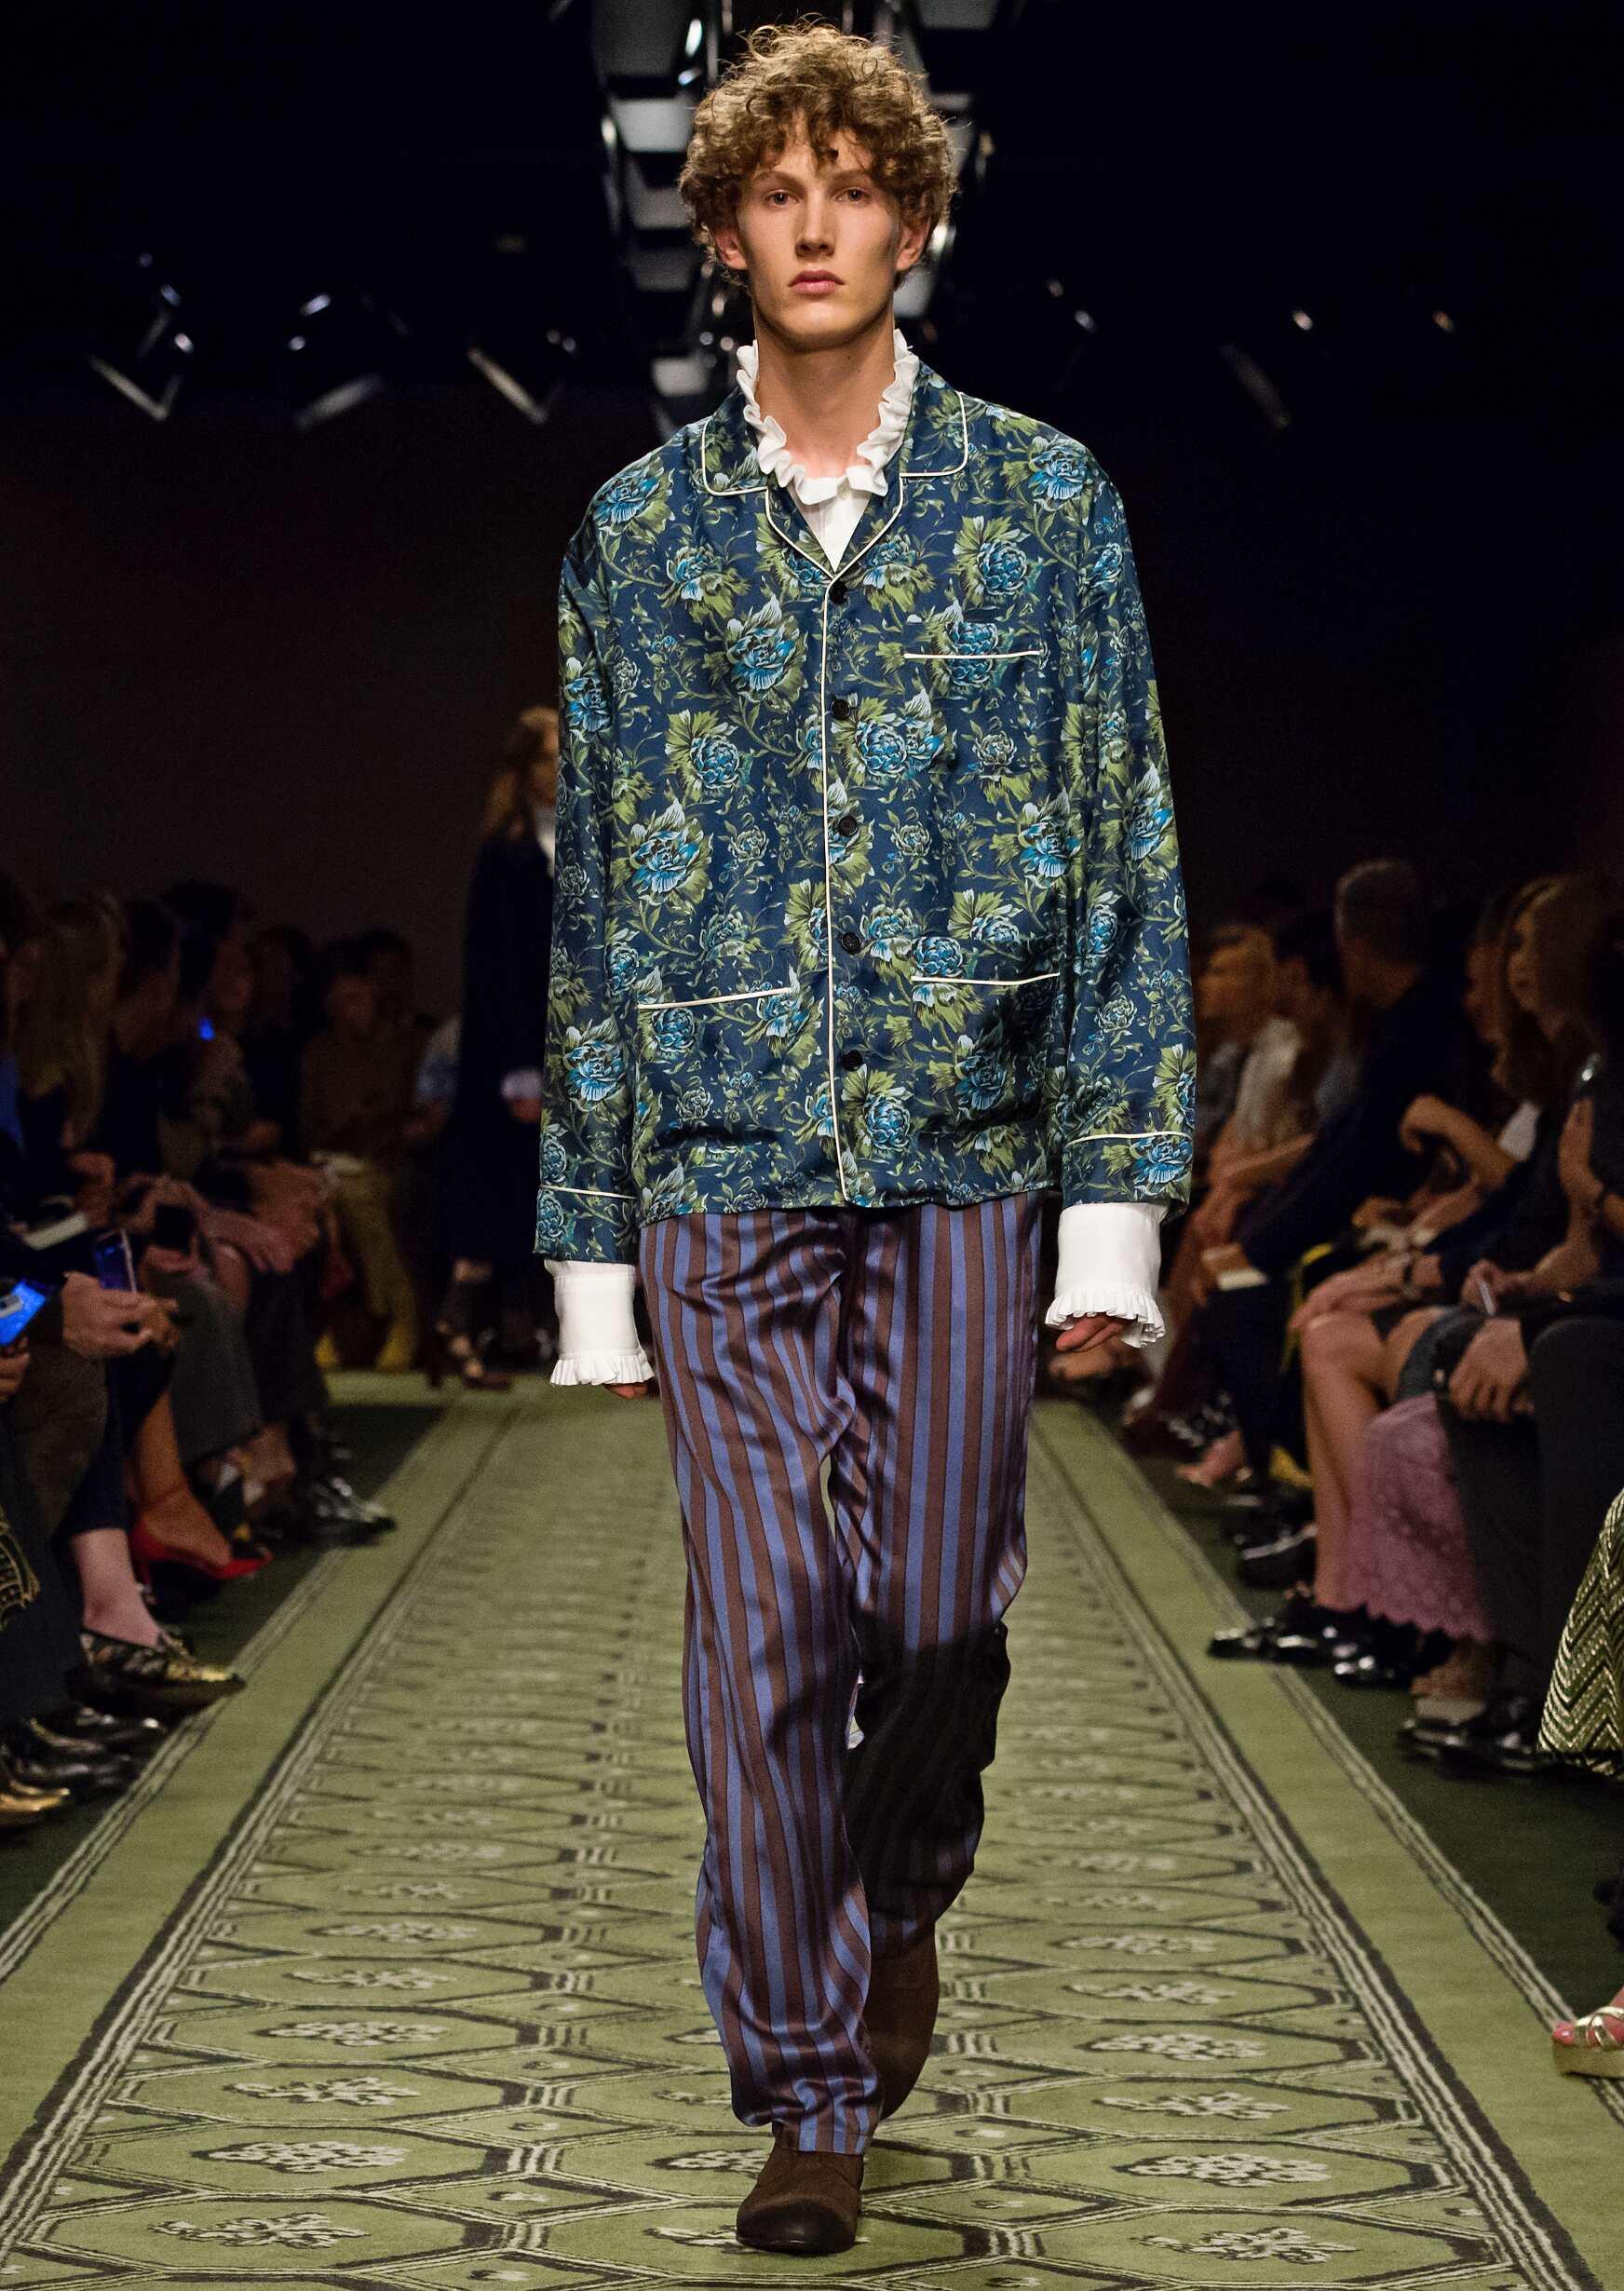 Man 2016 Burberry Catwalk London Fashion